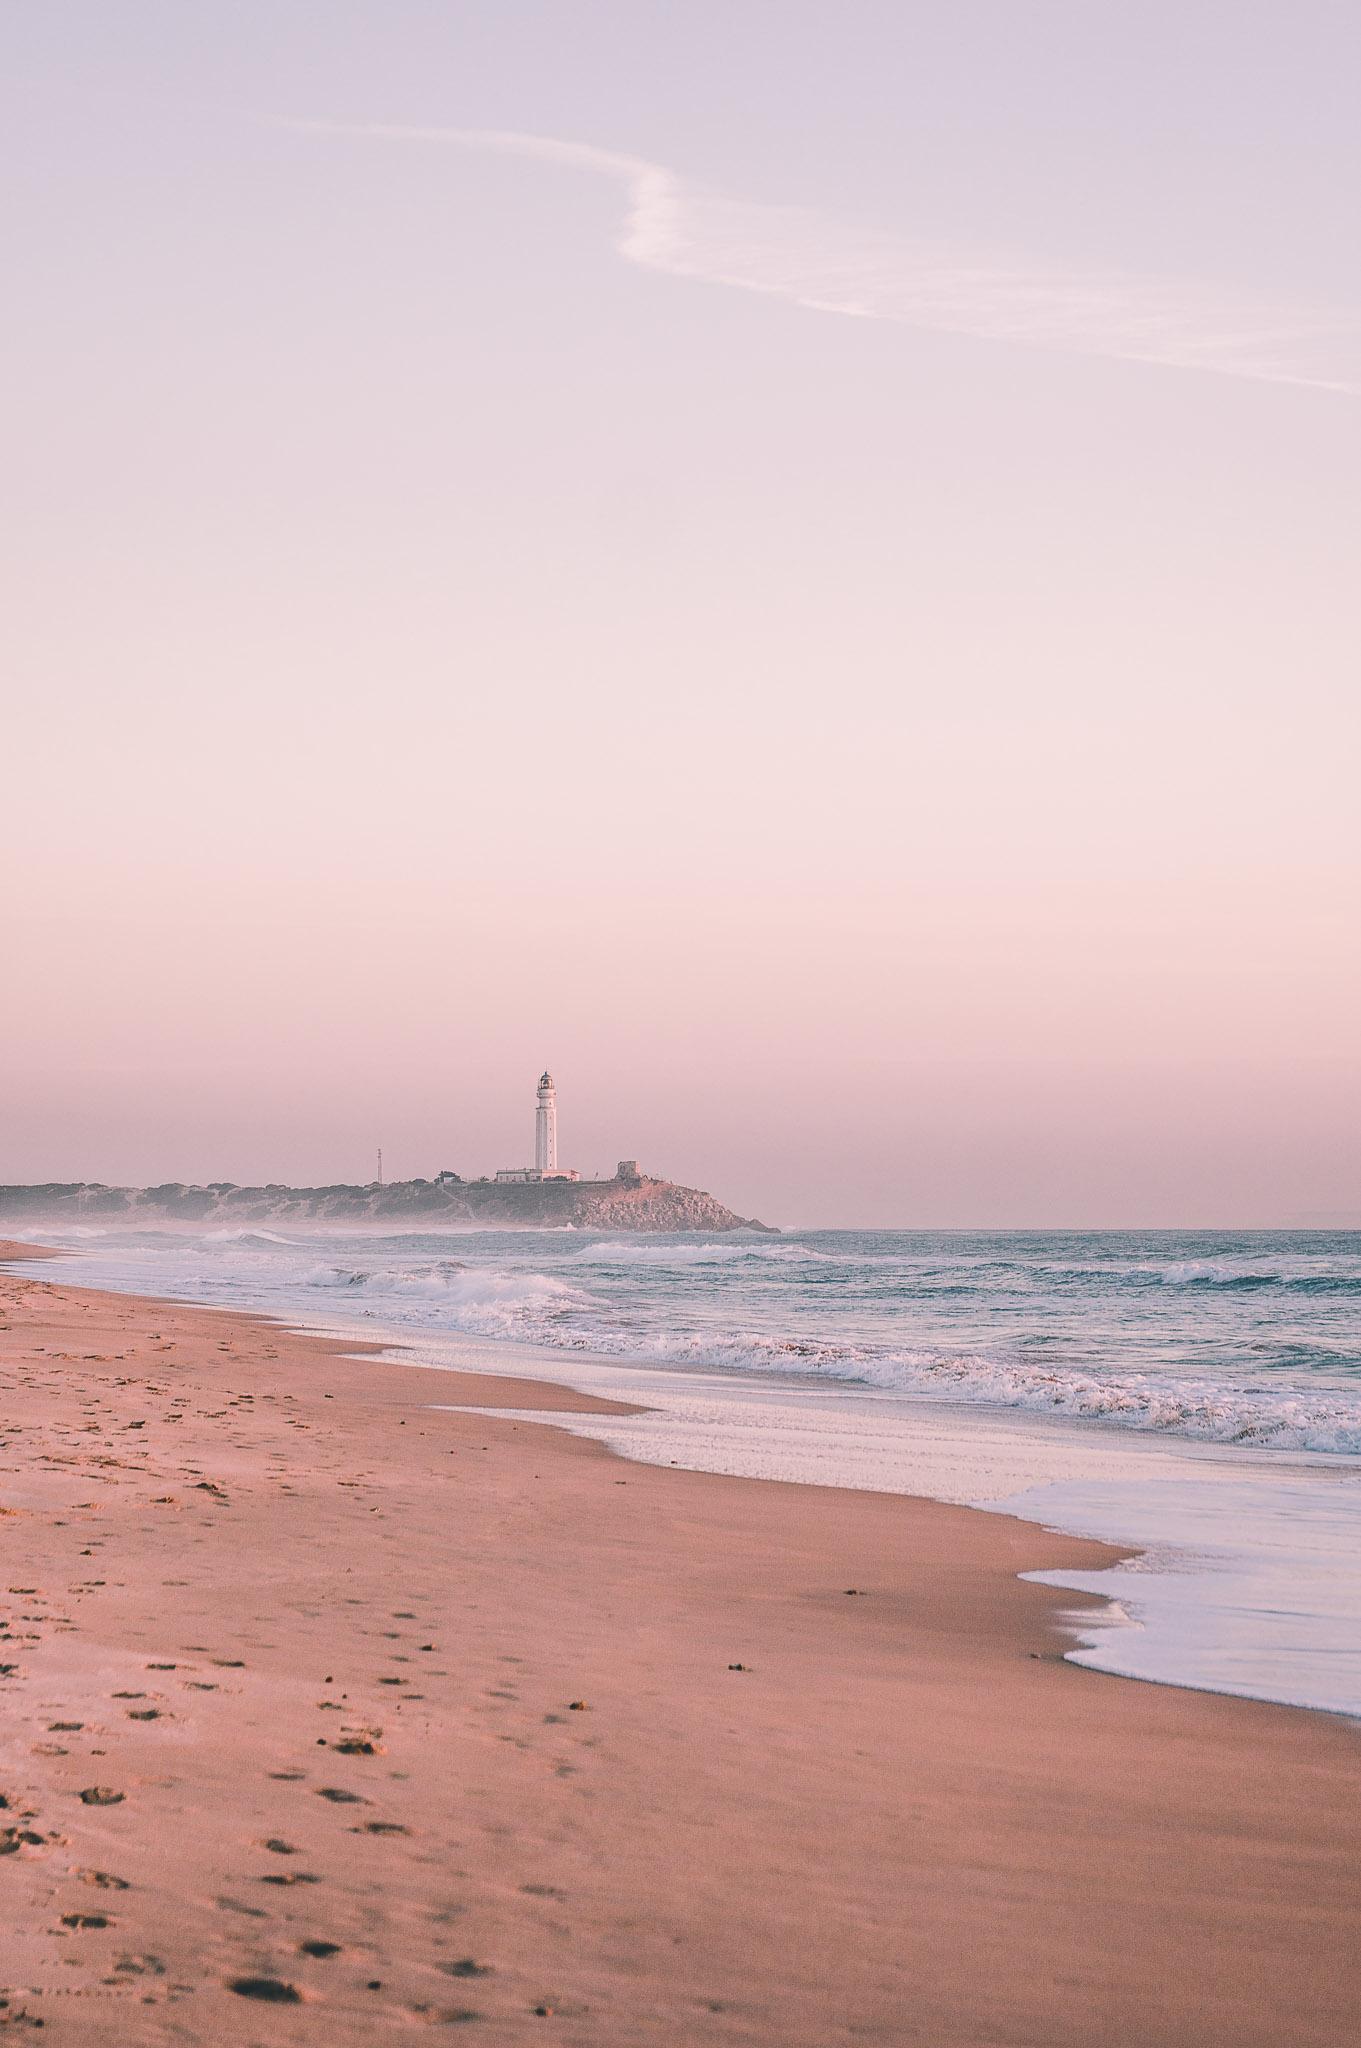 Latarnia morska na Cabo de Trafalgar, Hiszpania, Andaluzja